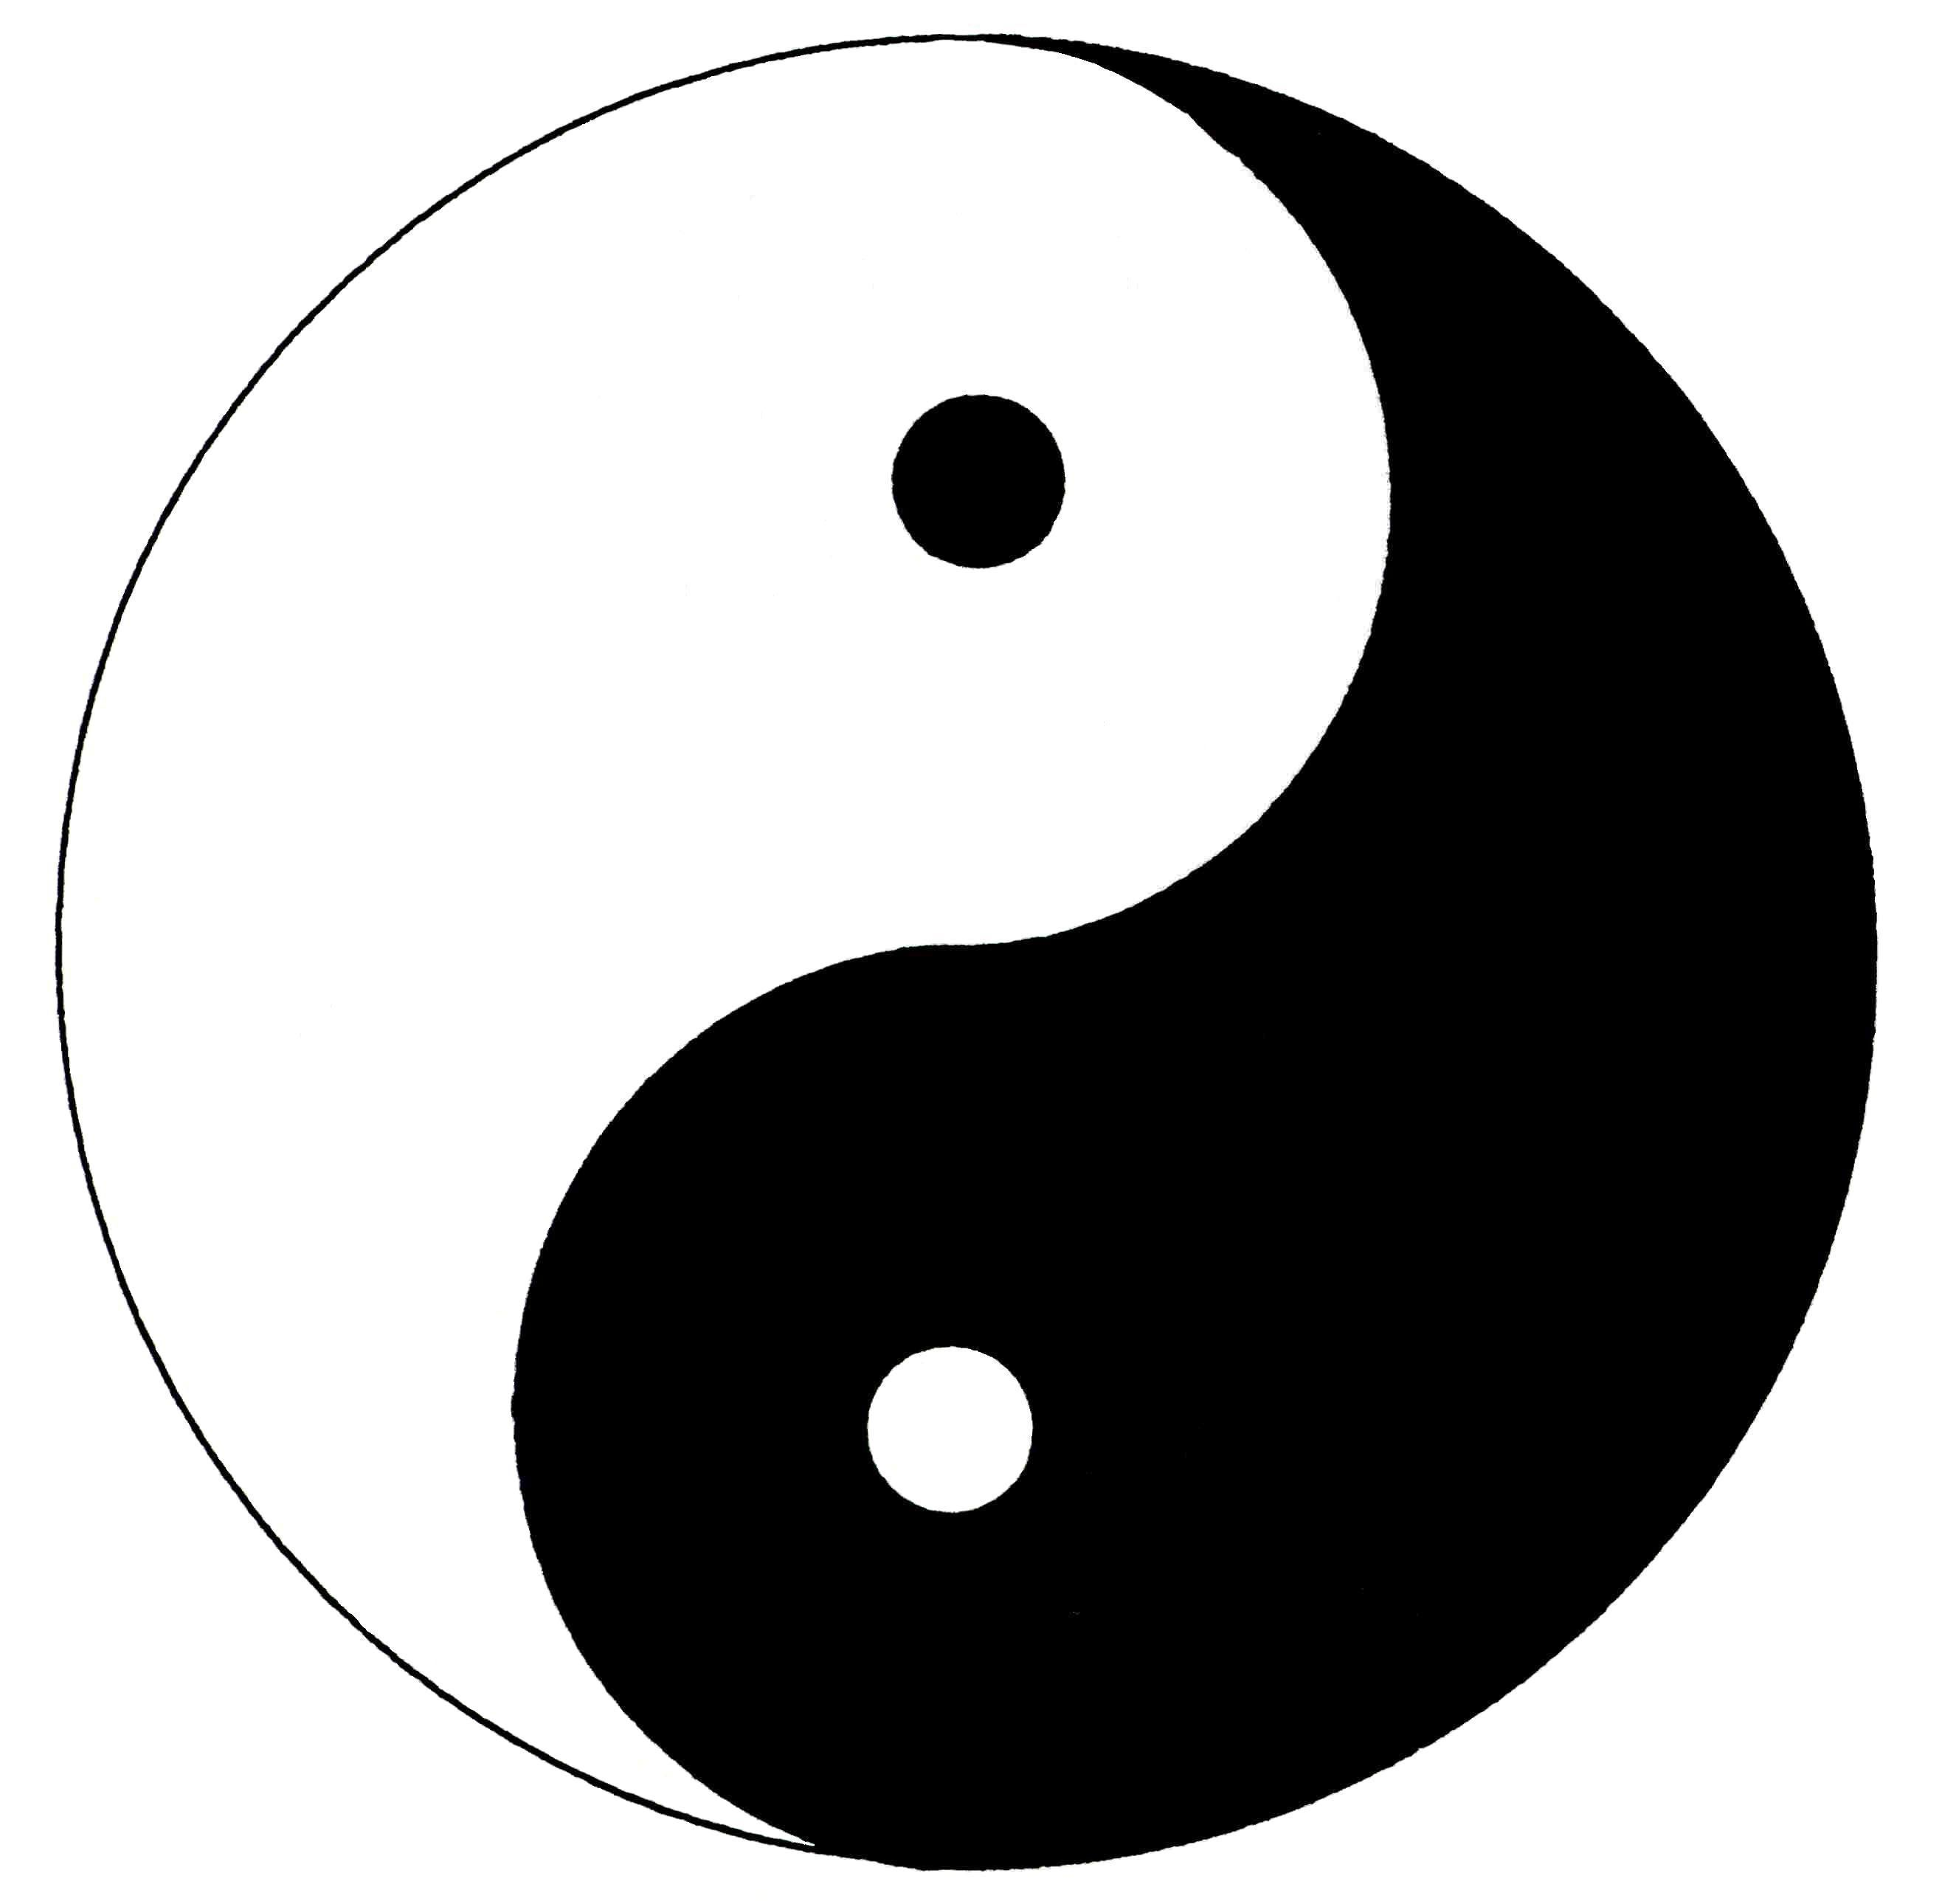 Ying Yang Of Creating Dreams Ying Yang Symbol Ying Yang Yin Yang